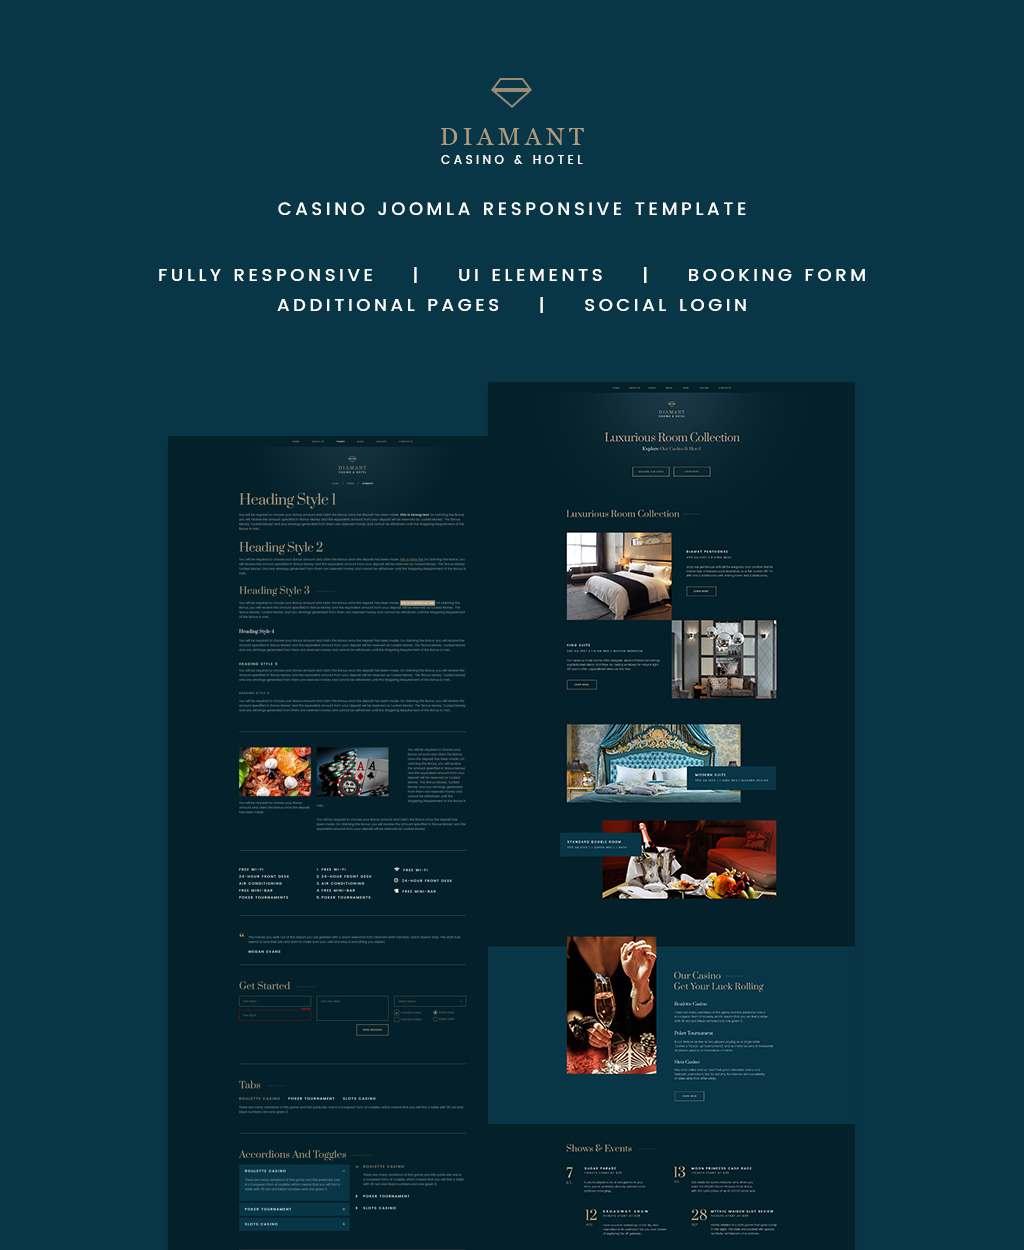 Diamant - Casino & Hotel Joomla Template TMT Talon Jameson